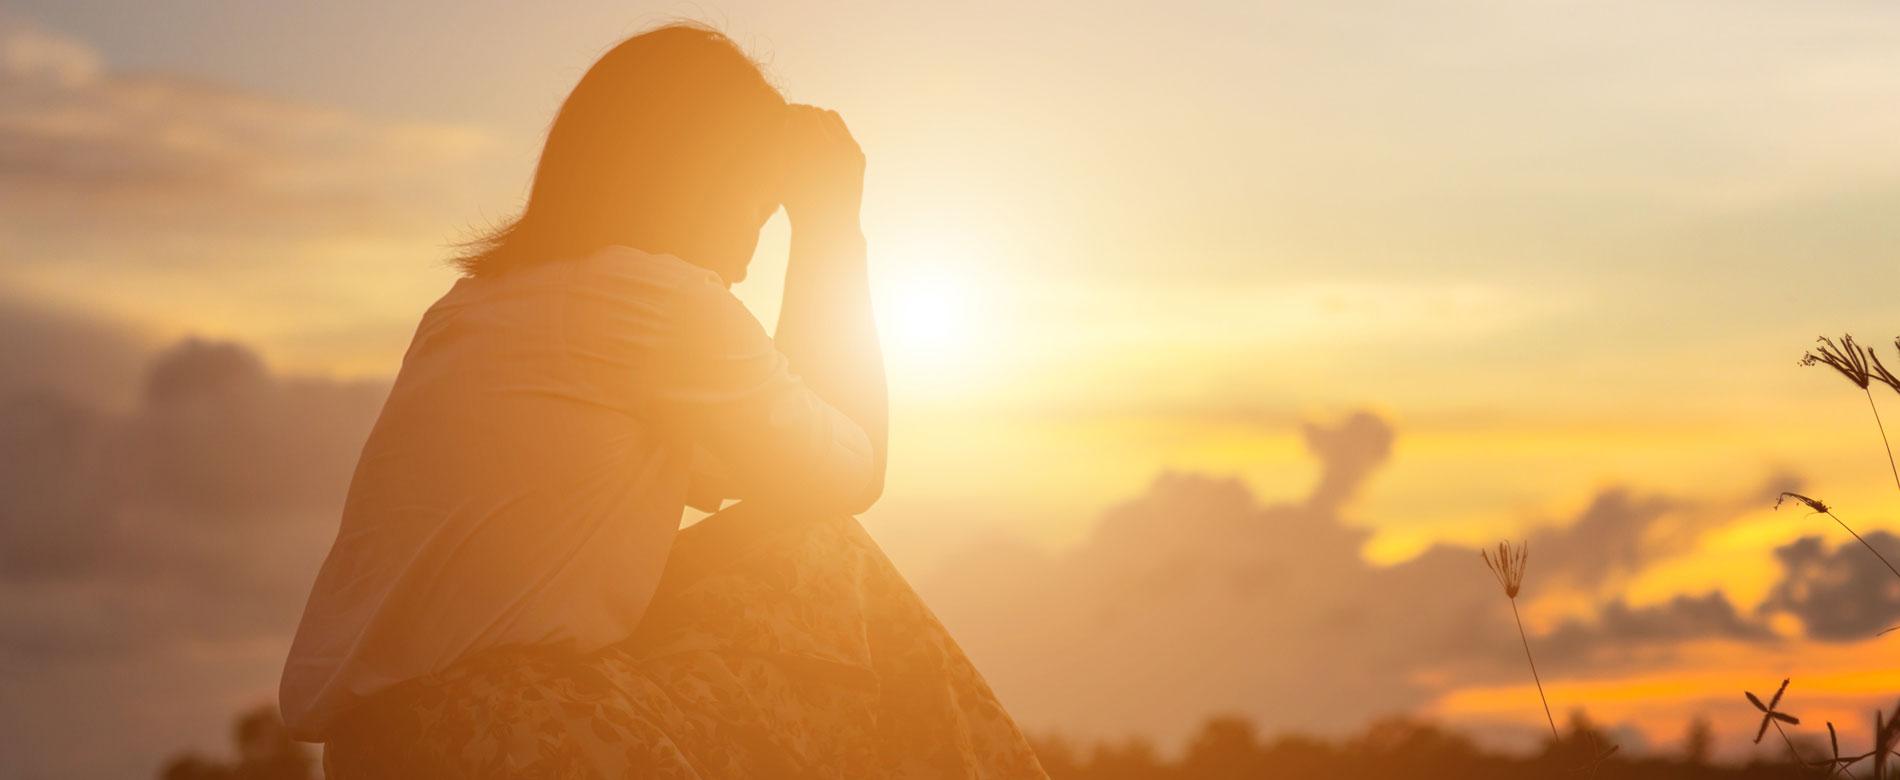 Resposta aos Internautas – Como me santificar sem me isolar?